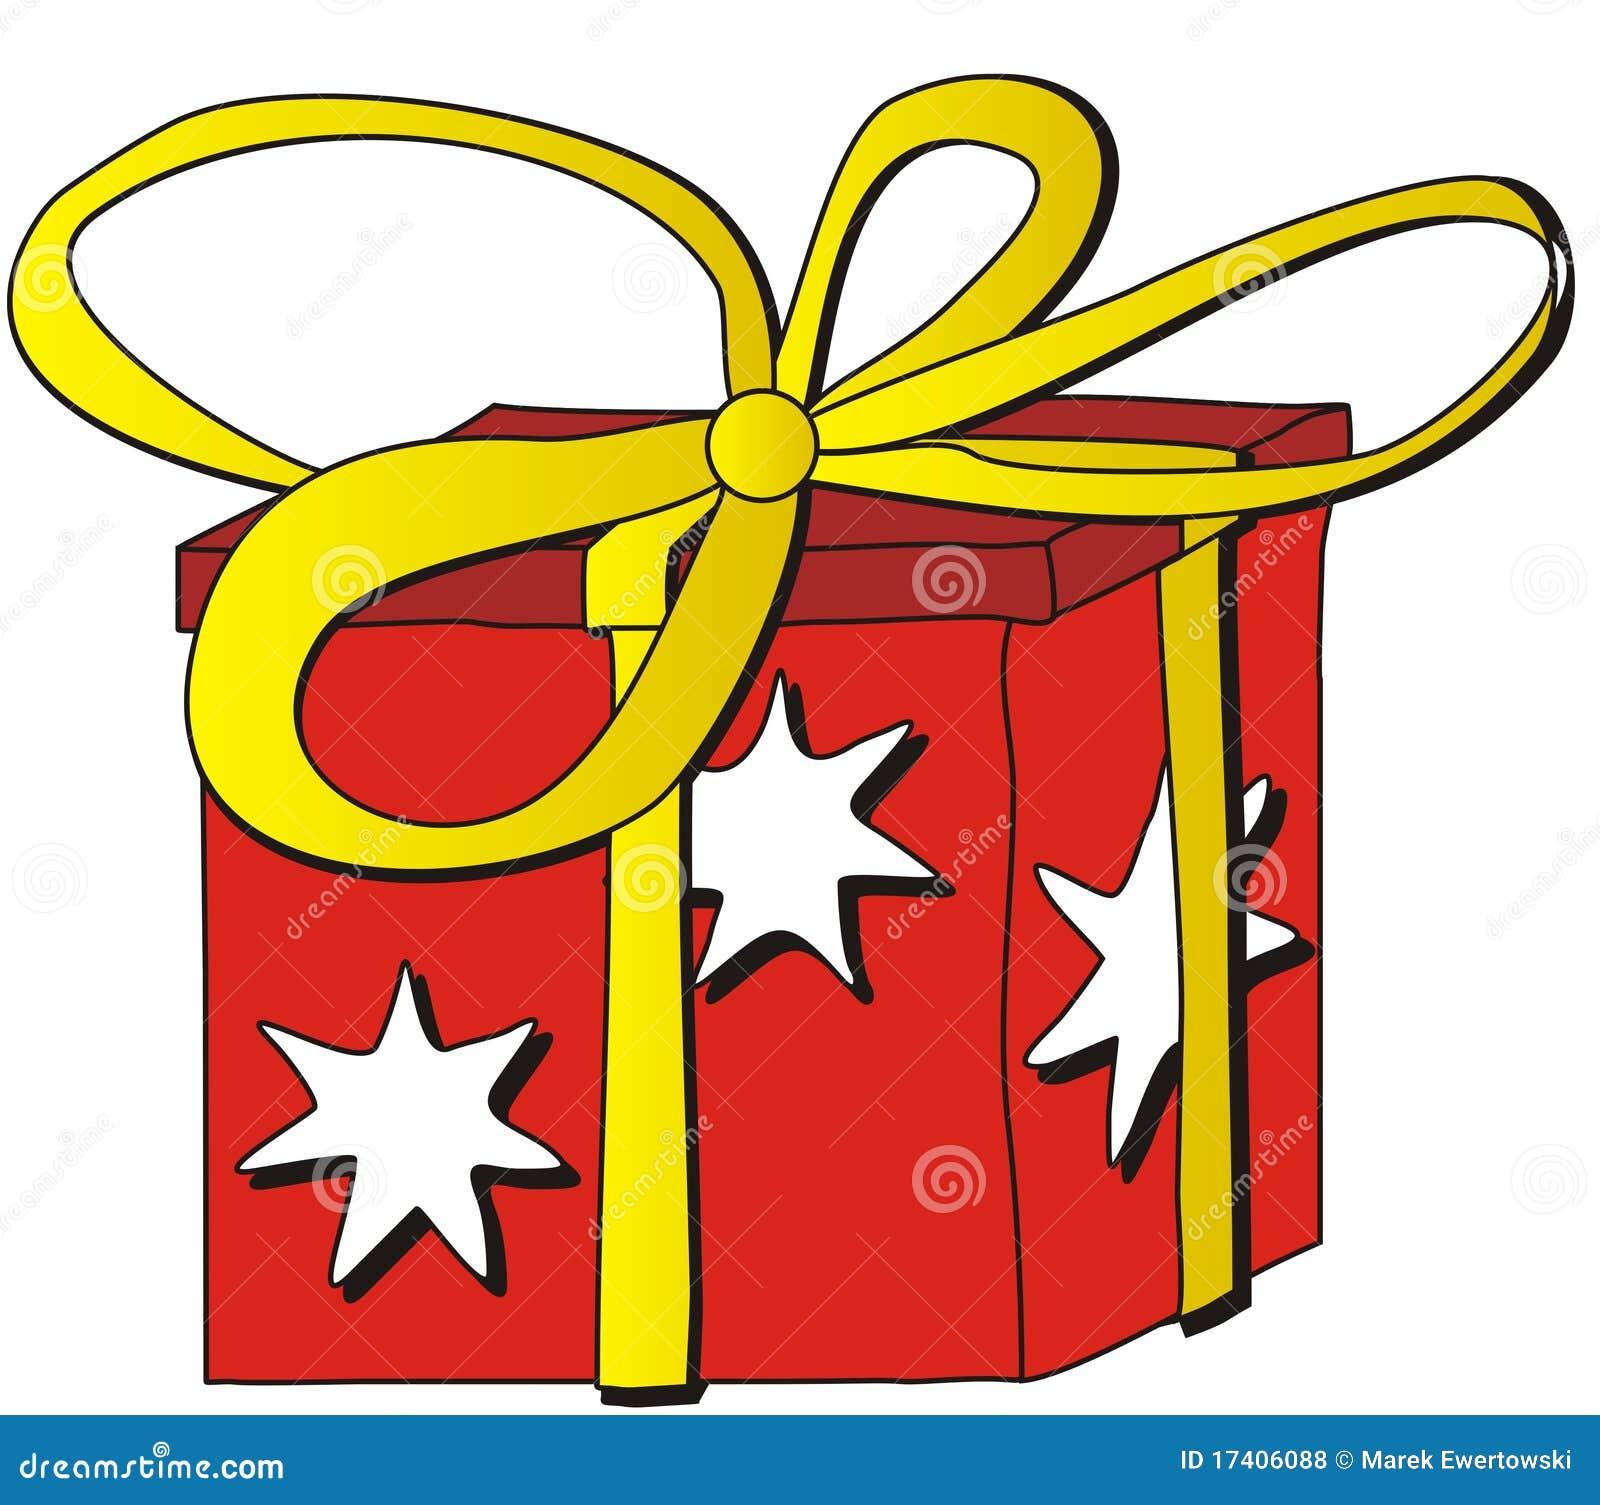 Dessin anim de cadeau photos libres de droits image - Dessin de cadeau ...